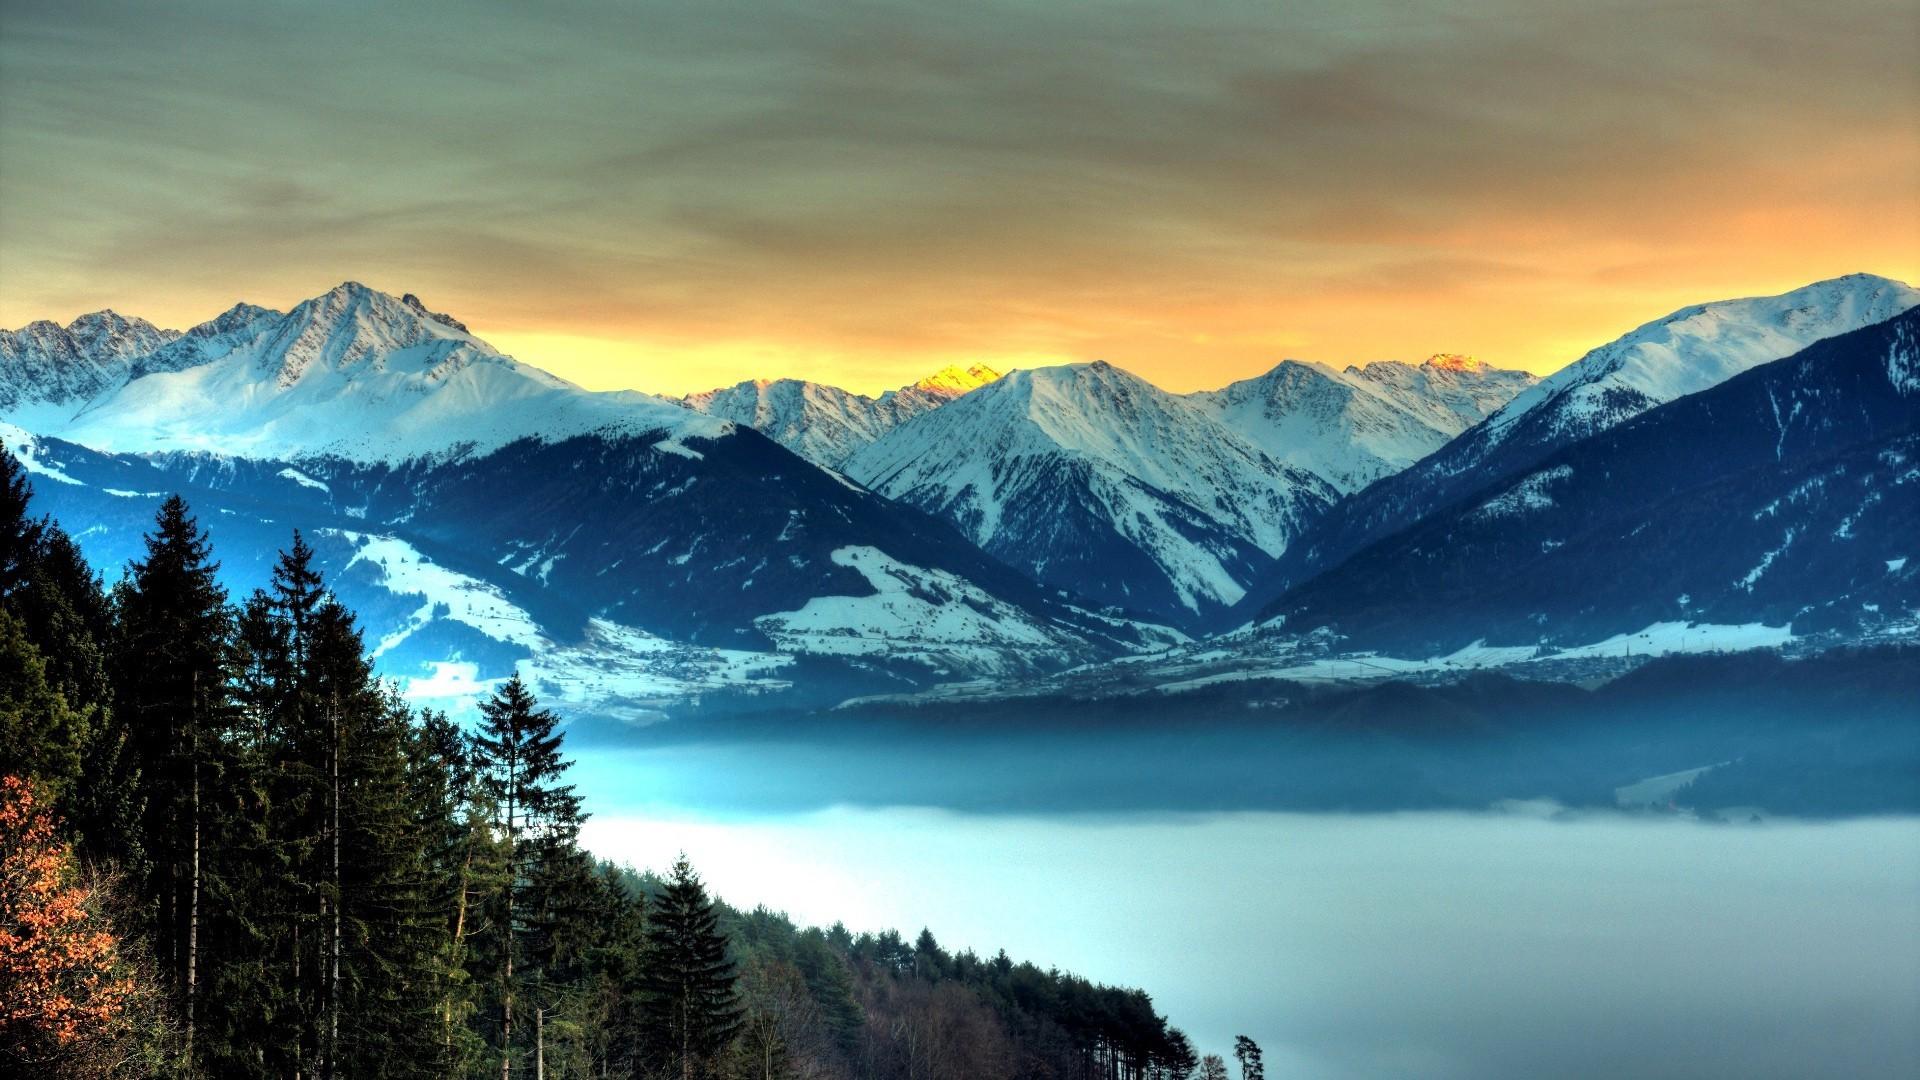 snowy mountains 27142